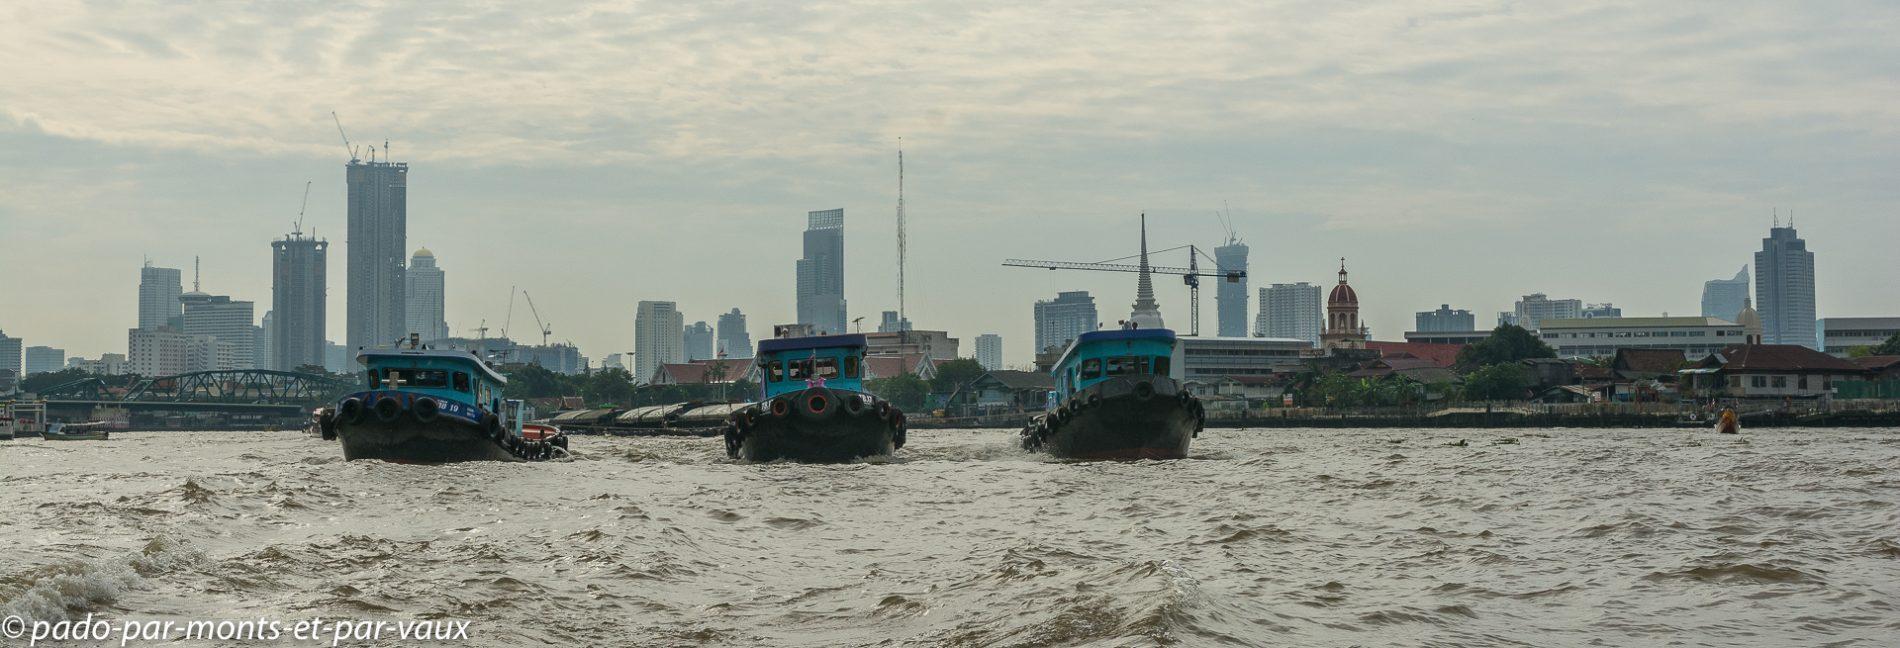 Bangkok - remorqueurs